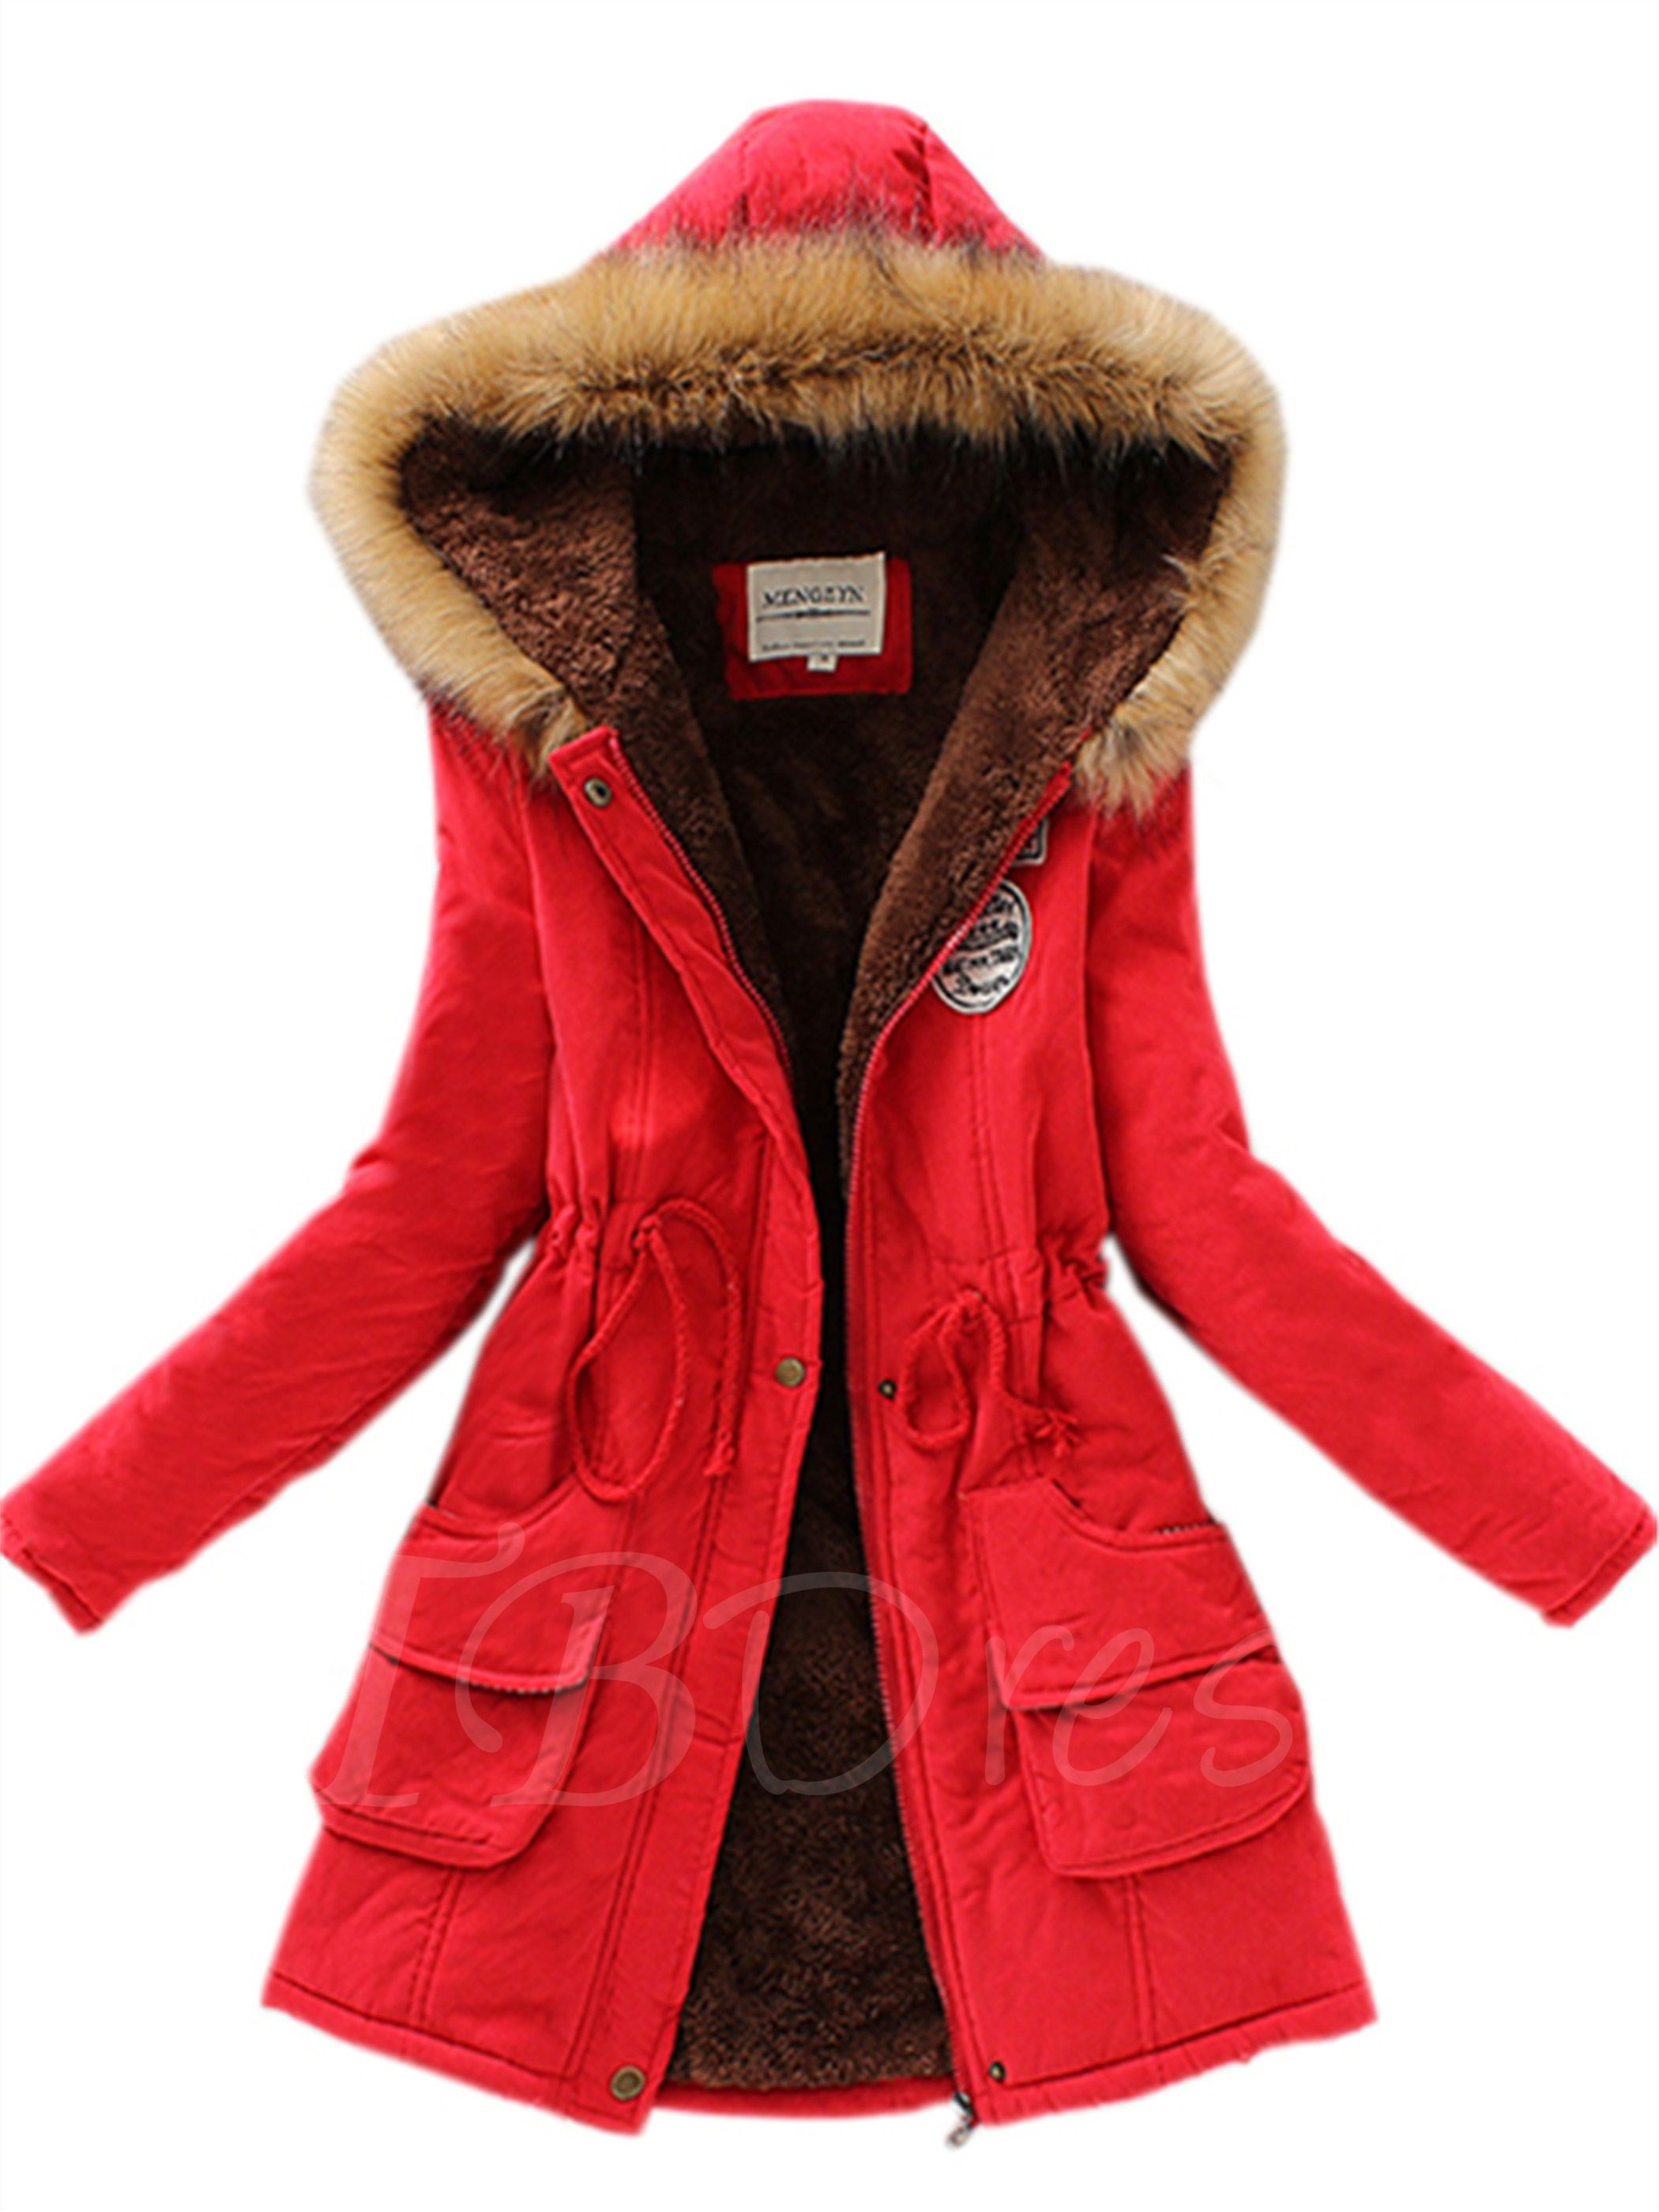 Lace Up Double Pockets Hooded Women S Cotton Overcoat Winter Coats Women Winter Jackets Women Hooded Cotton Coat [ 2800 x 2100 Pixel ]